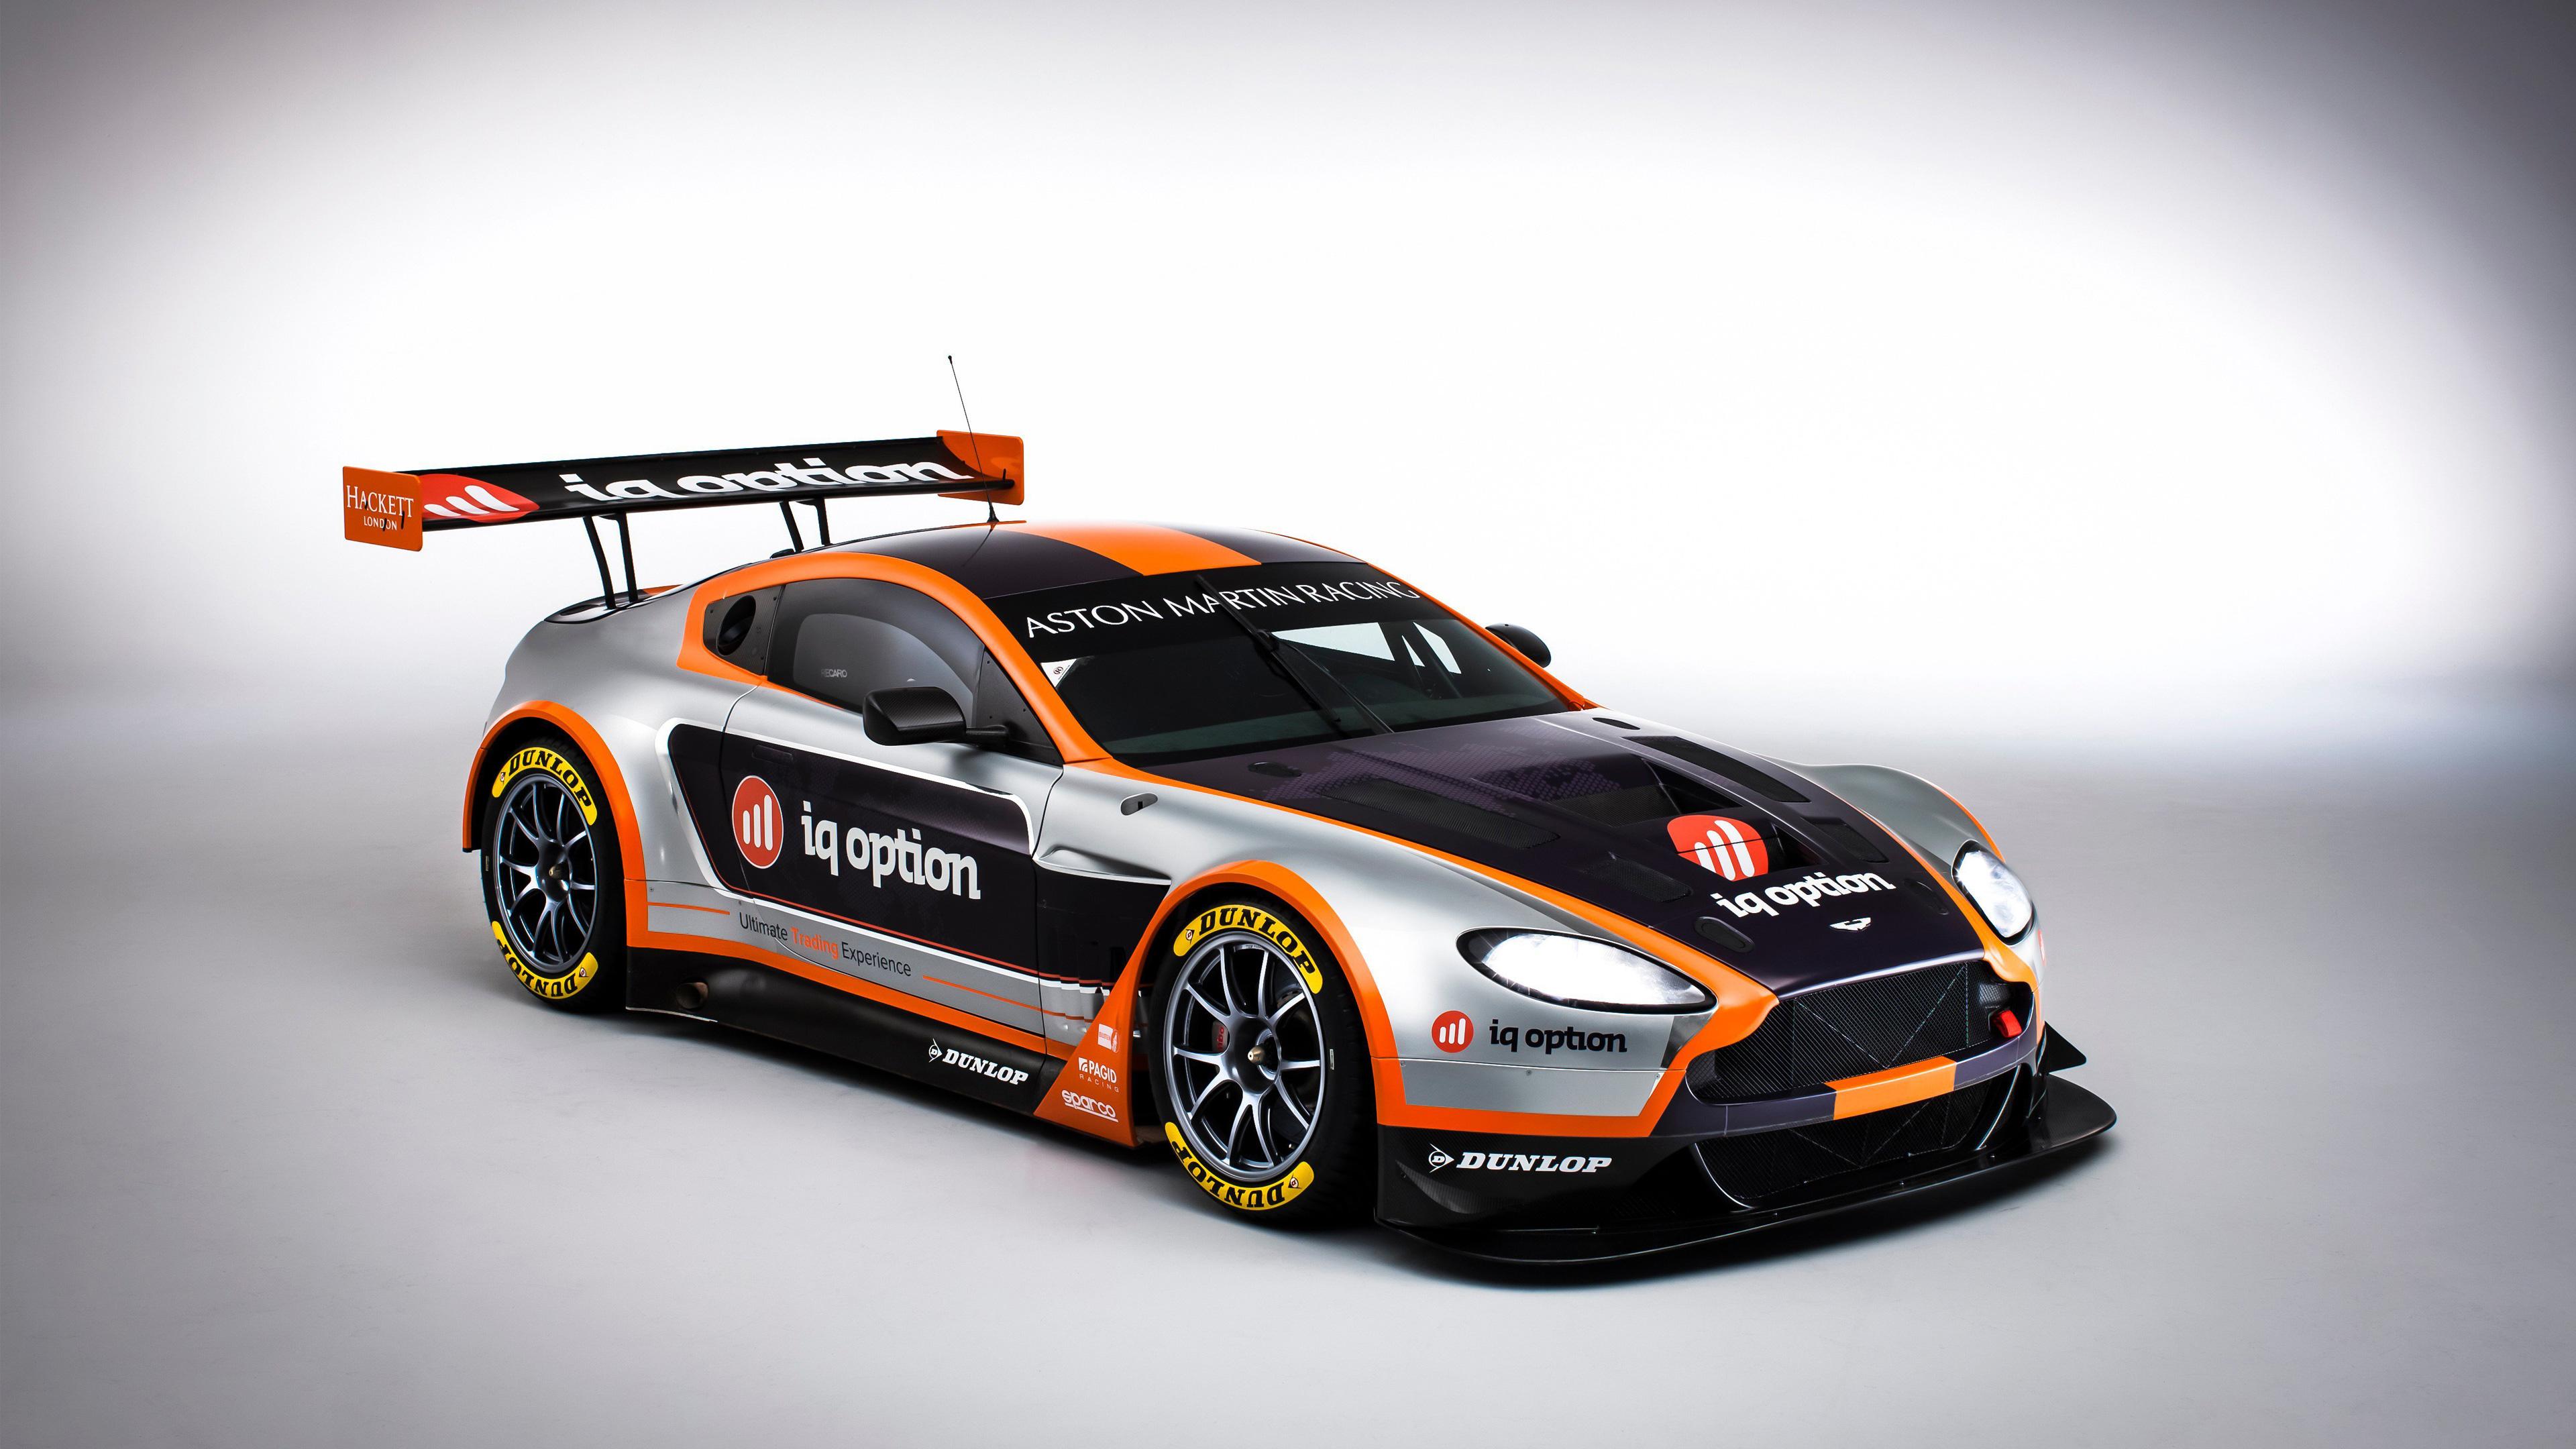 Aston Martin Db11 Race Car 2917415 Hd Wallpaper Backgrounds Download